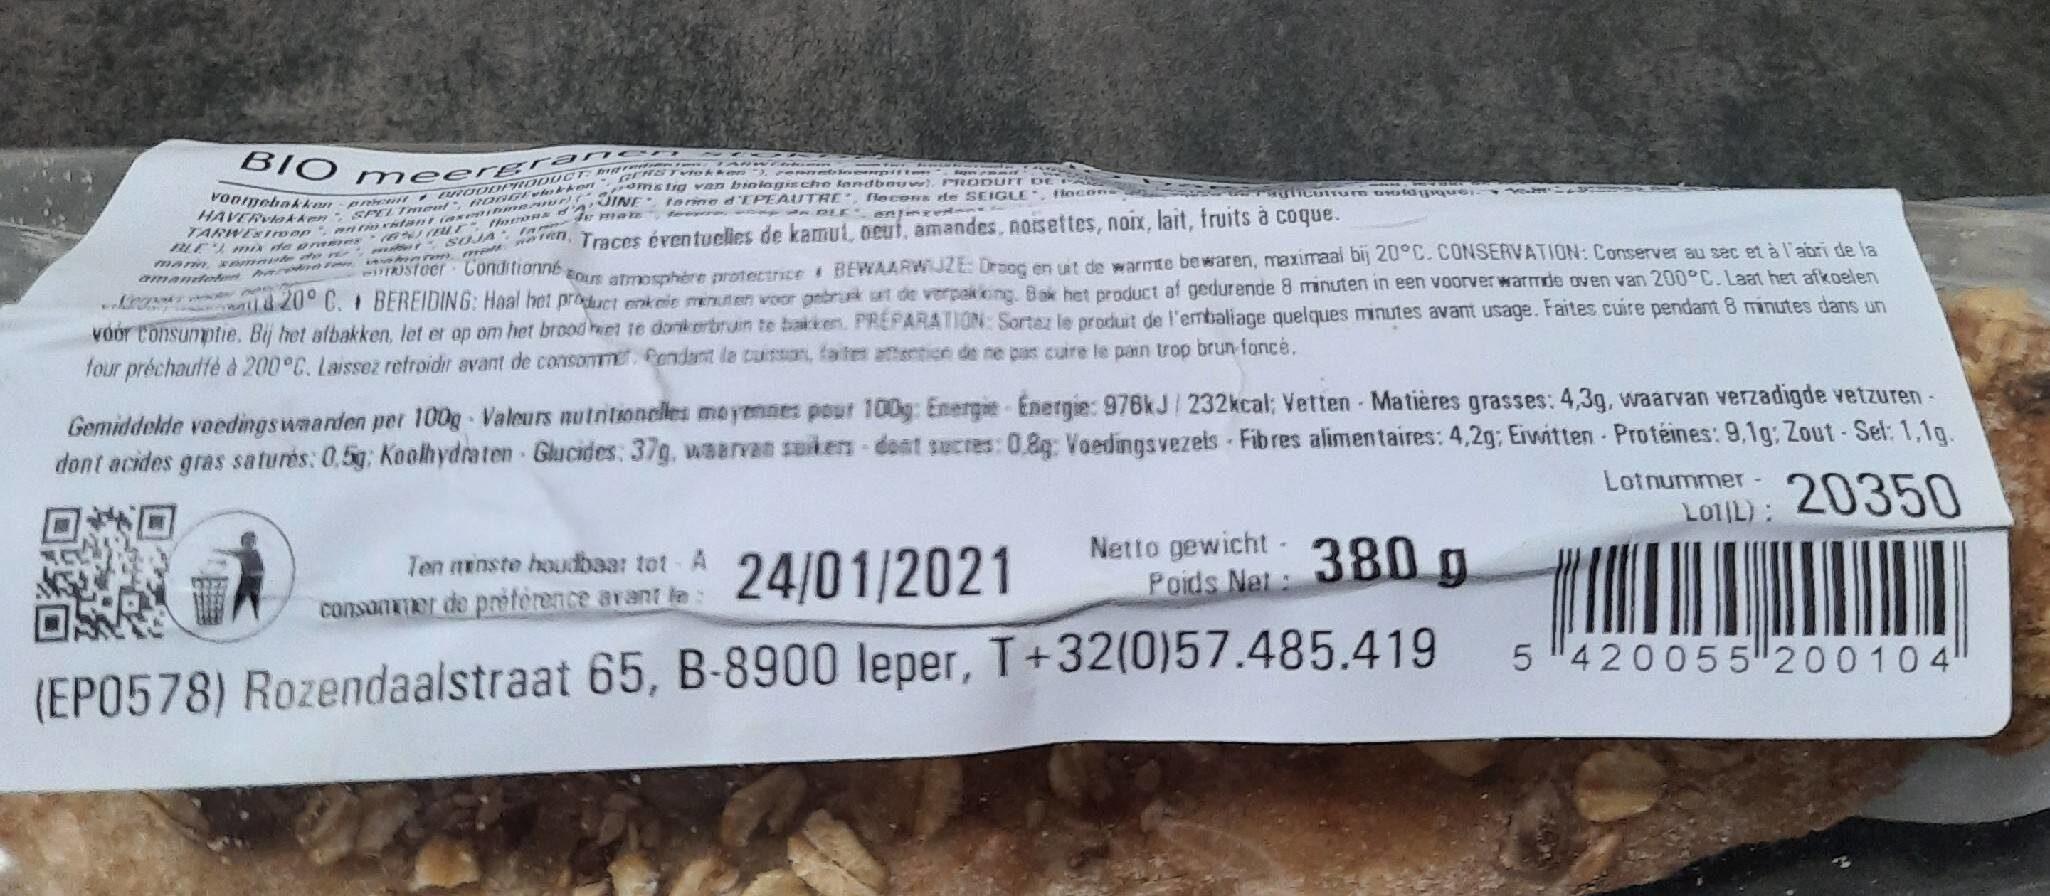 BAGUETTE MULTICEREALES - Voedingswaarden - fr